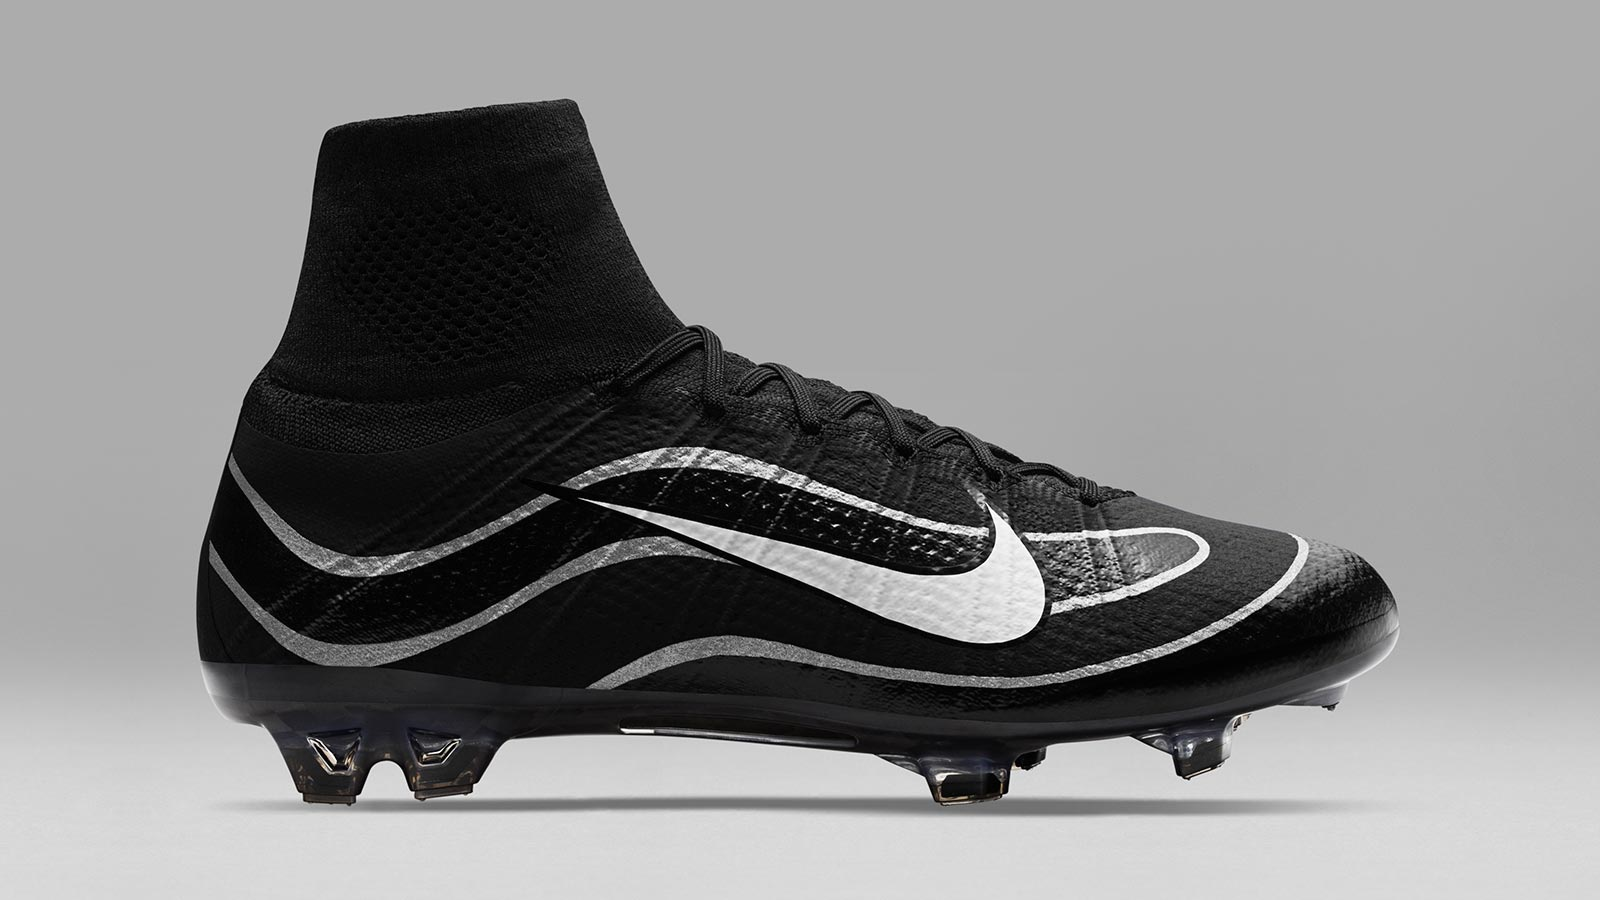 Black & White Nike Mercurial Superfly Heritage